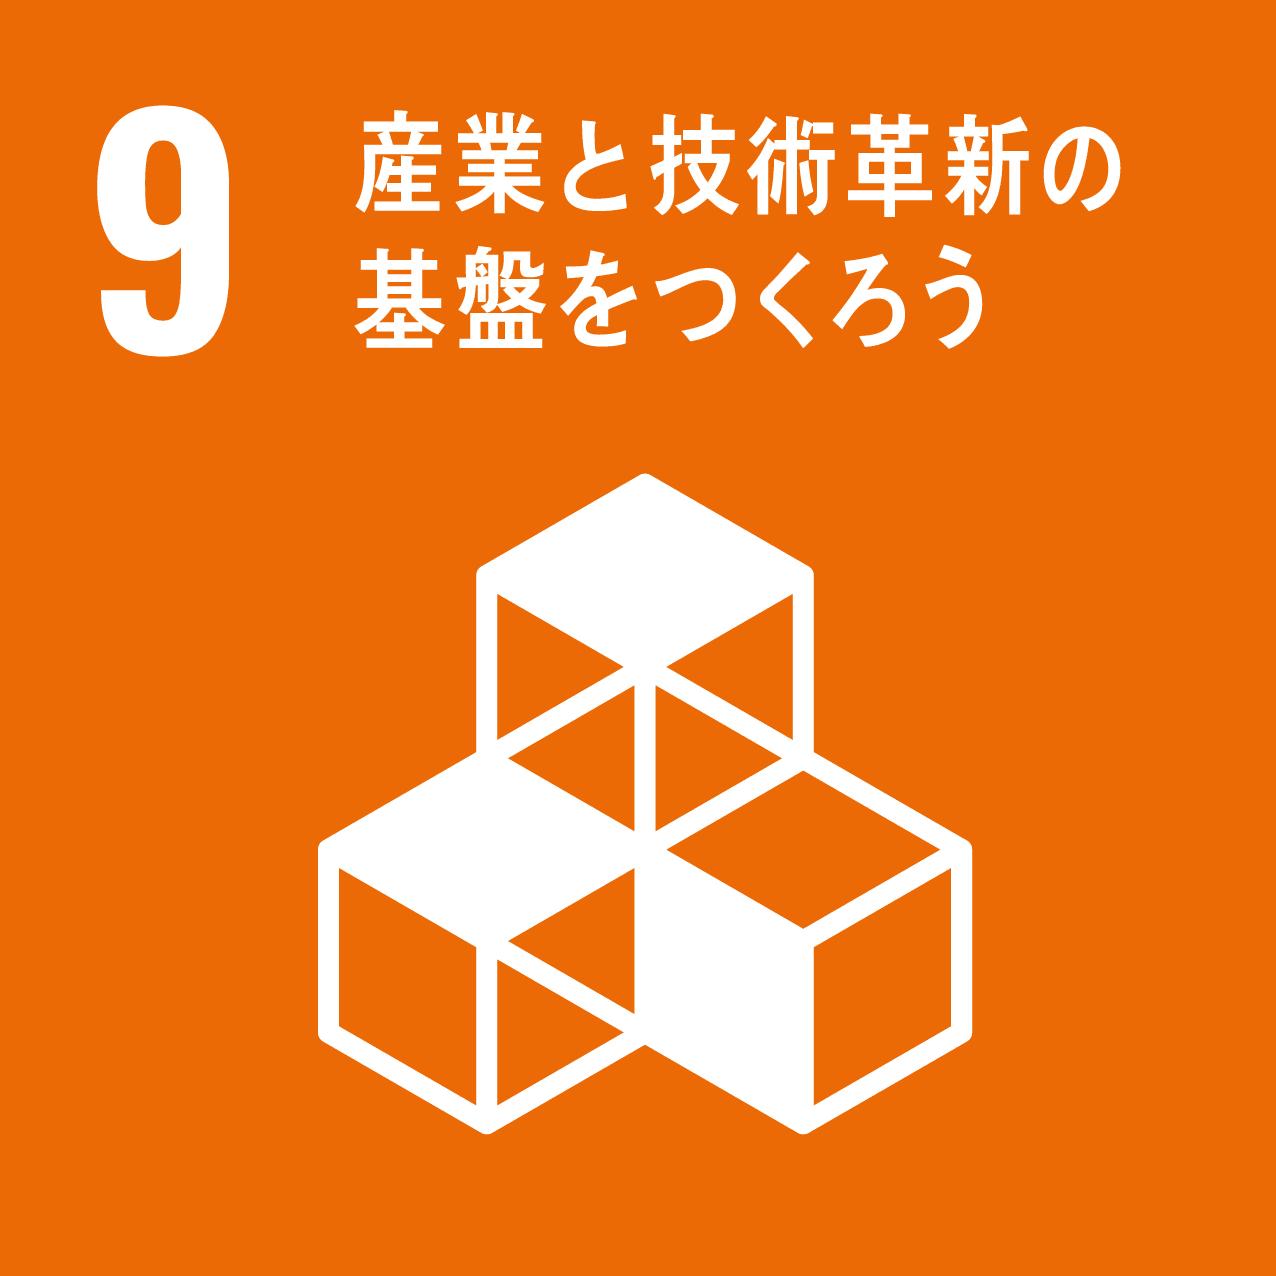 http://okaji.co.jp/files/libs/106/202006151707259257.png